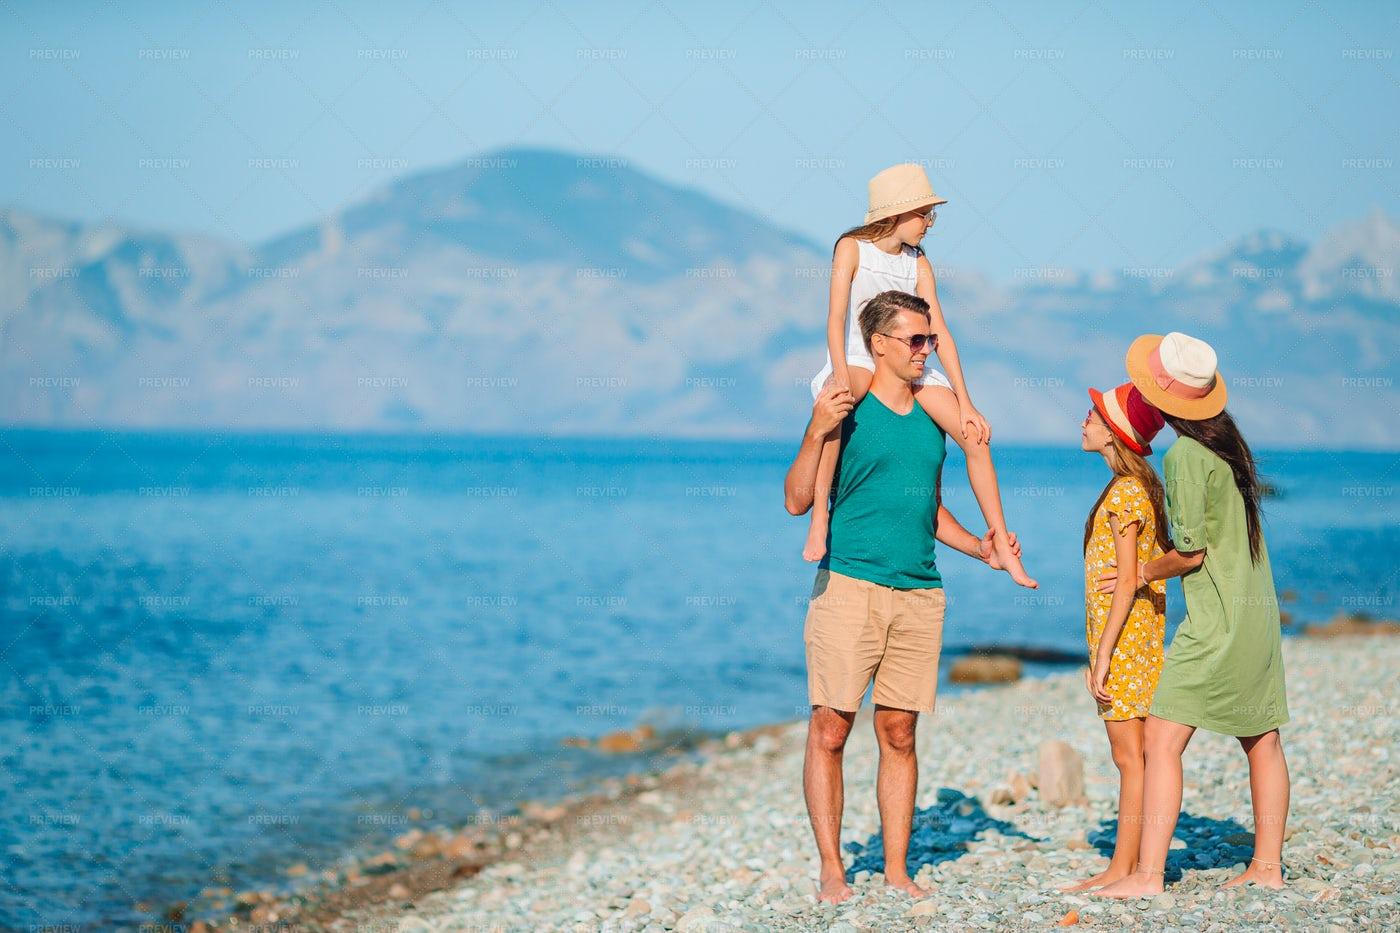 Family On Vacation At The Beach: Stock Photos